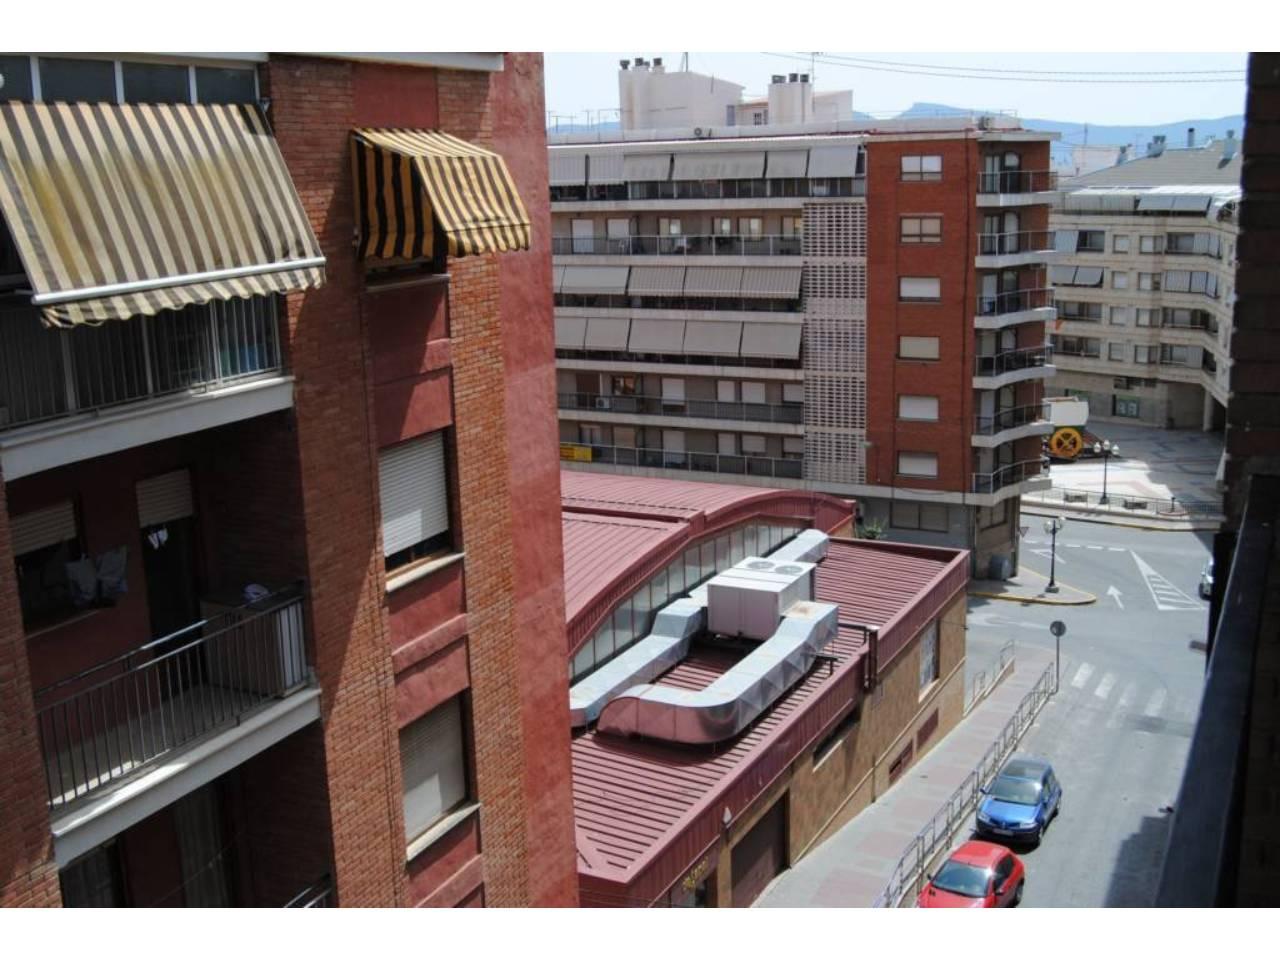 Lloguer Pis  Calle doctor  marañón, 10. Piso en alquiler, 4º c/a, al lado del mercado central y mercadon